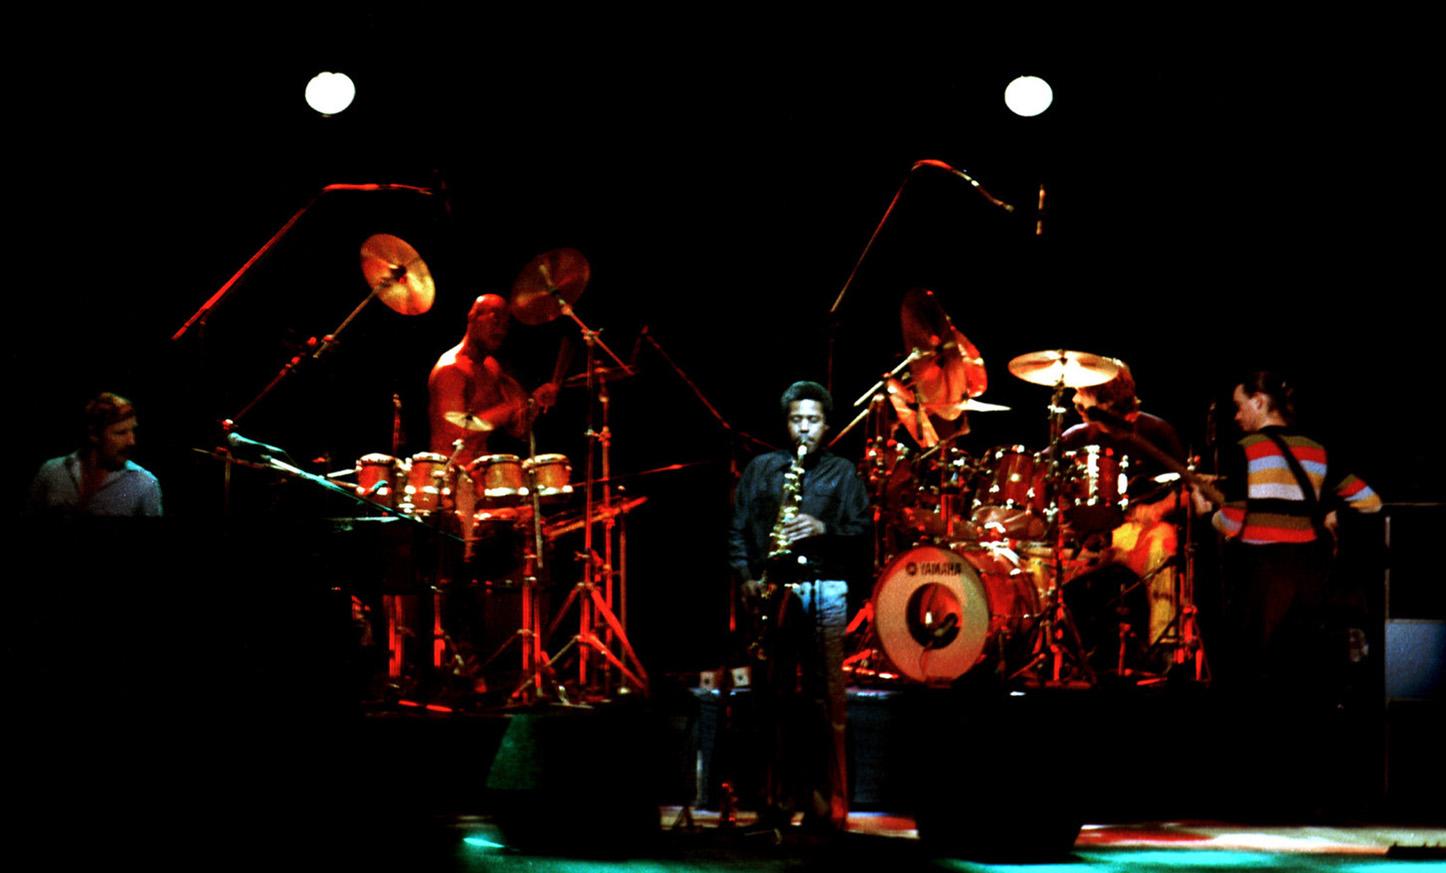 Montreux Jazz Festival >> File:Weather Report 19810611 shinjuku fn13.jpg - Wikimedia Commons